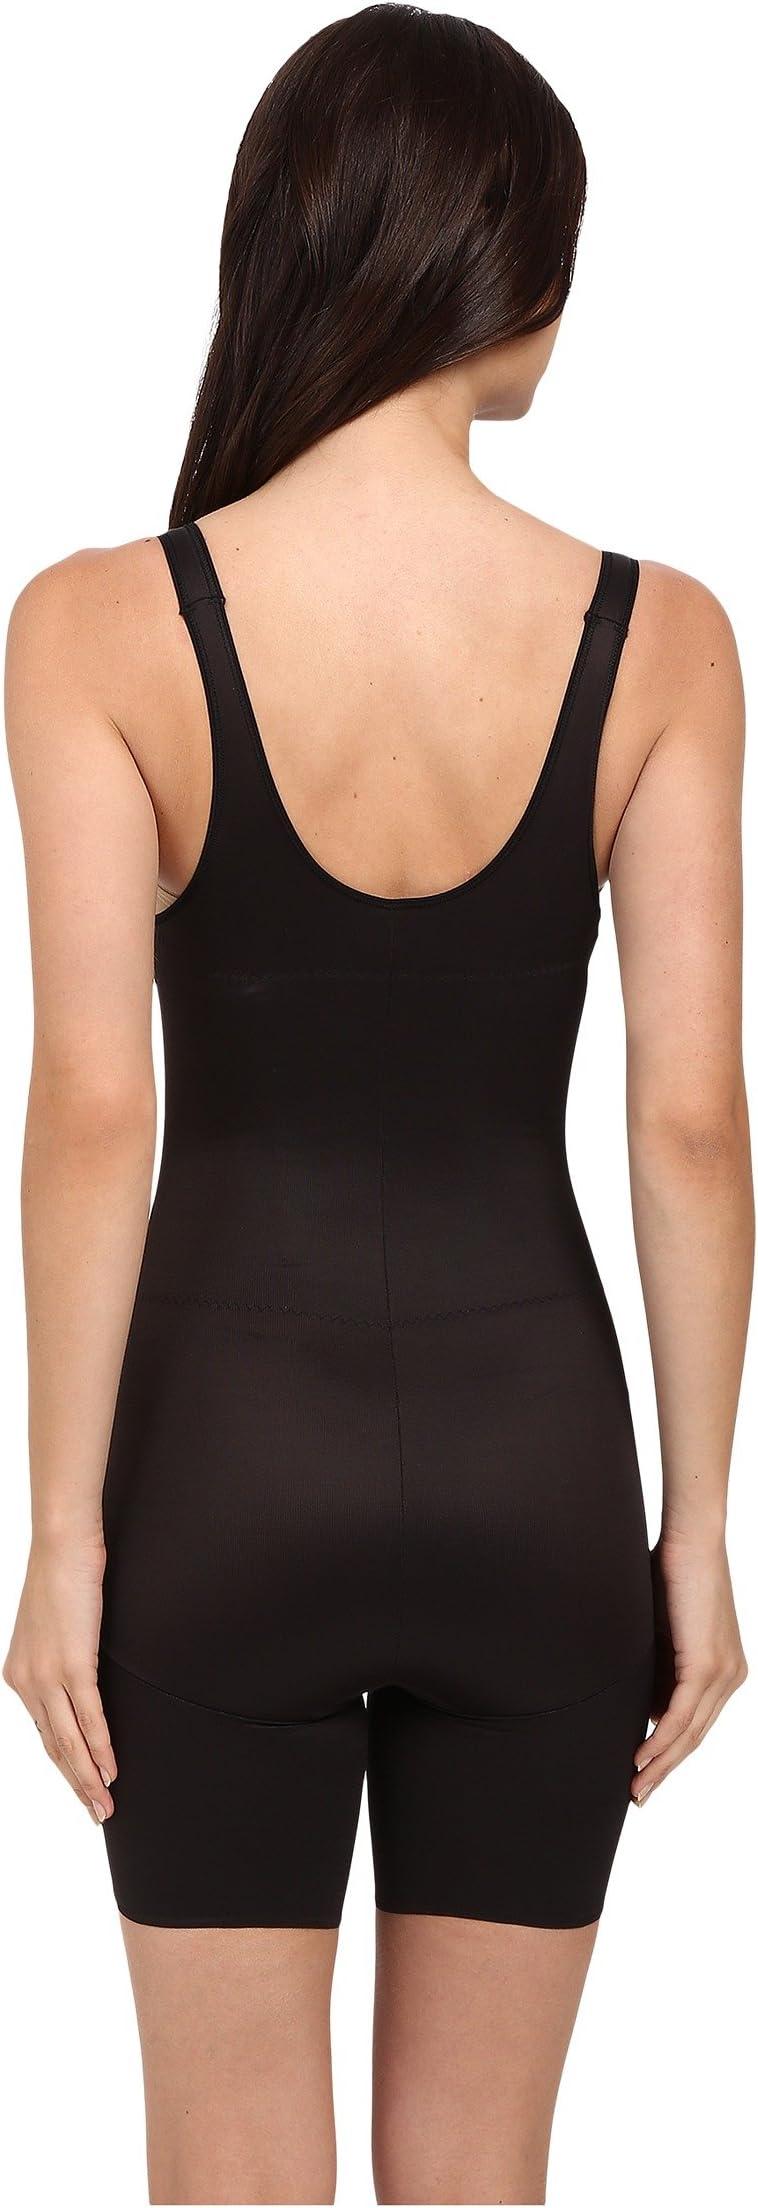 Miraclesuit Shapewear Back Magic Extra Firm Torsette Thigh Slimmer FsQcaZ